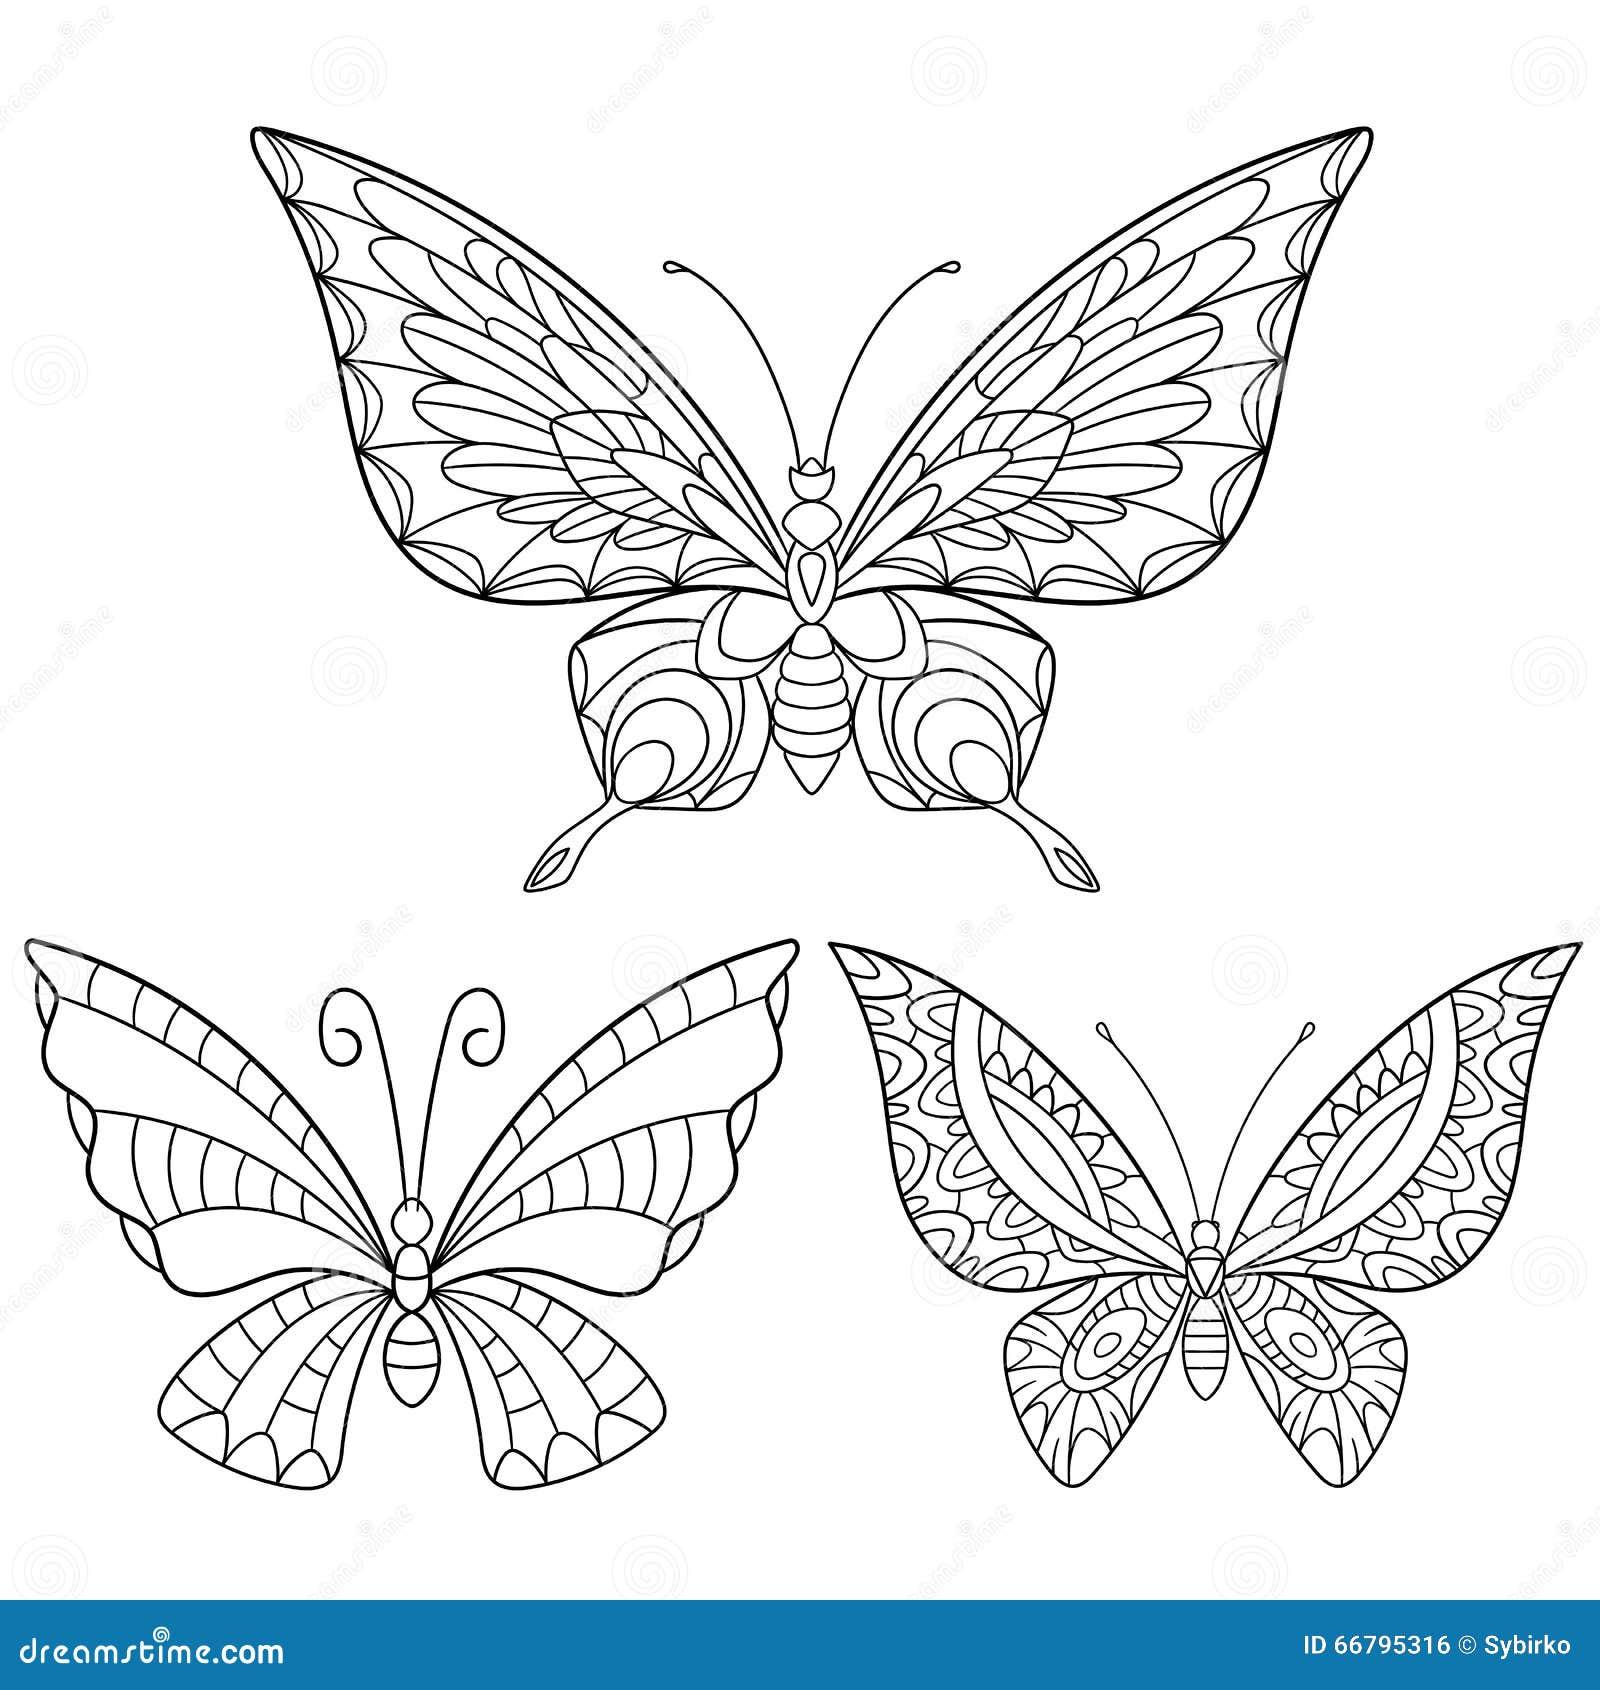 Zentangle stiliserade samlingen av tre fjärilar